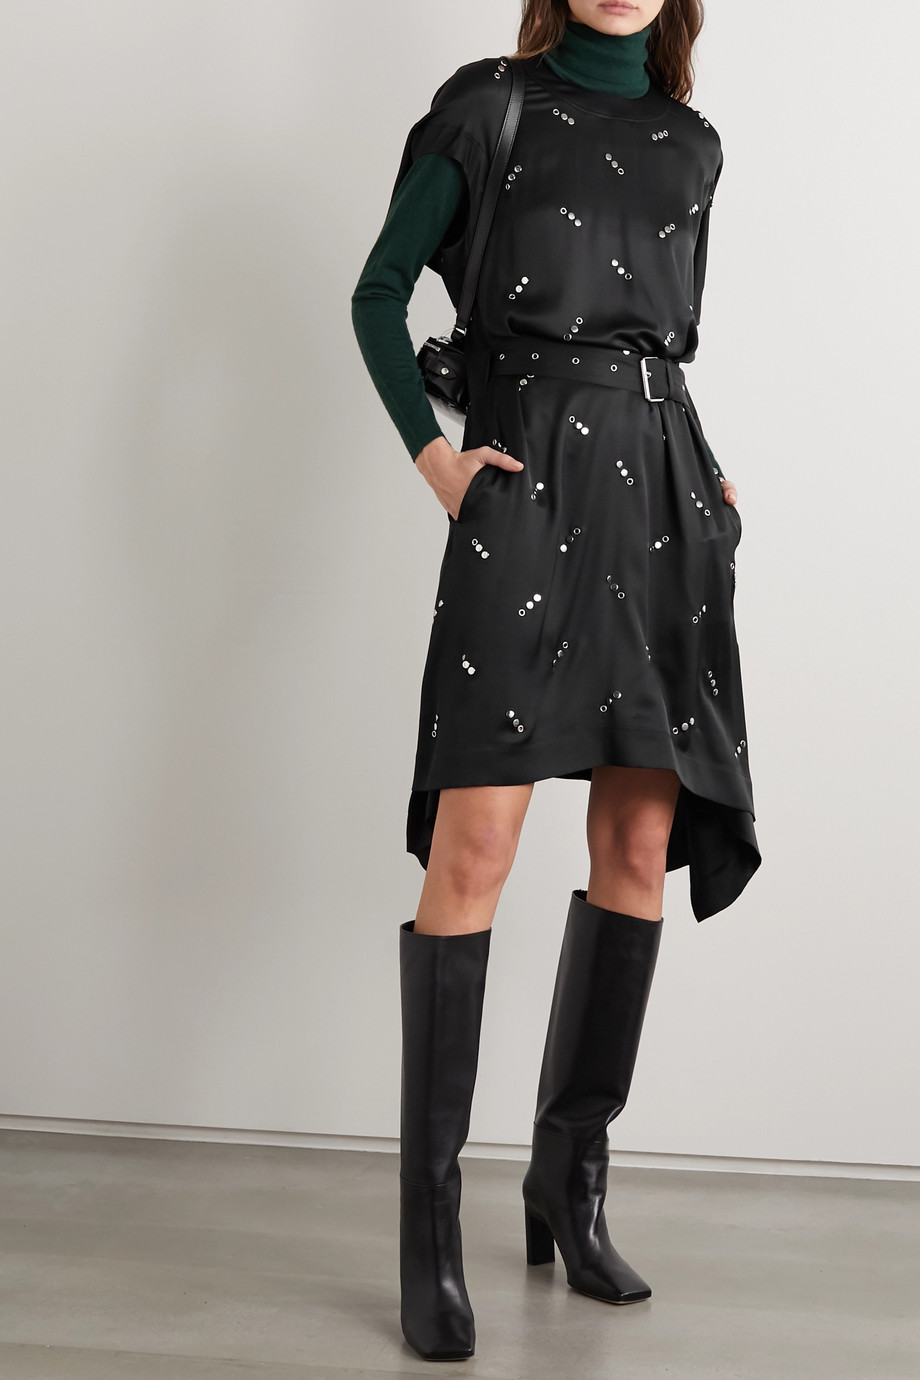 Burberry Kleid aus verziertem Seidensatin mit Gürtel